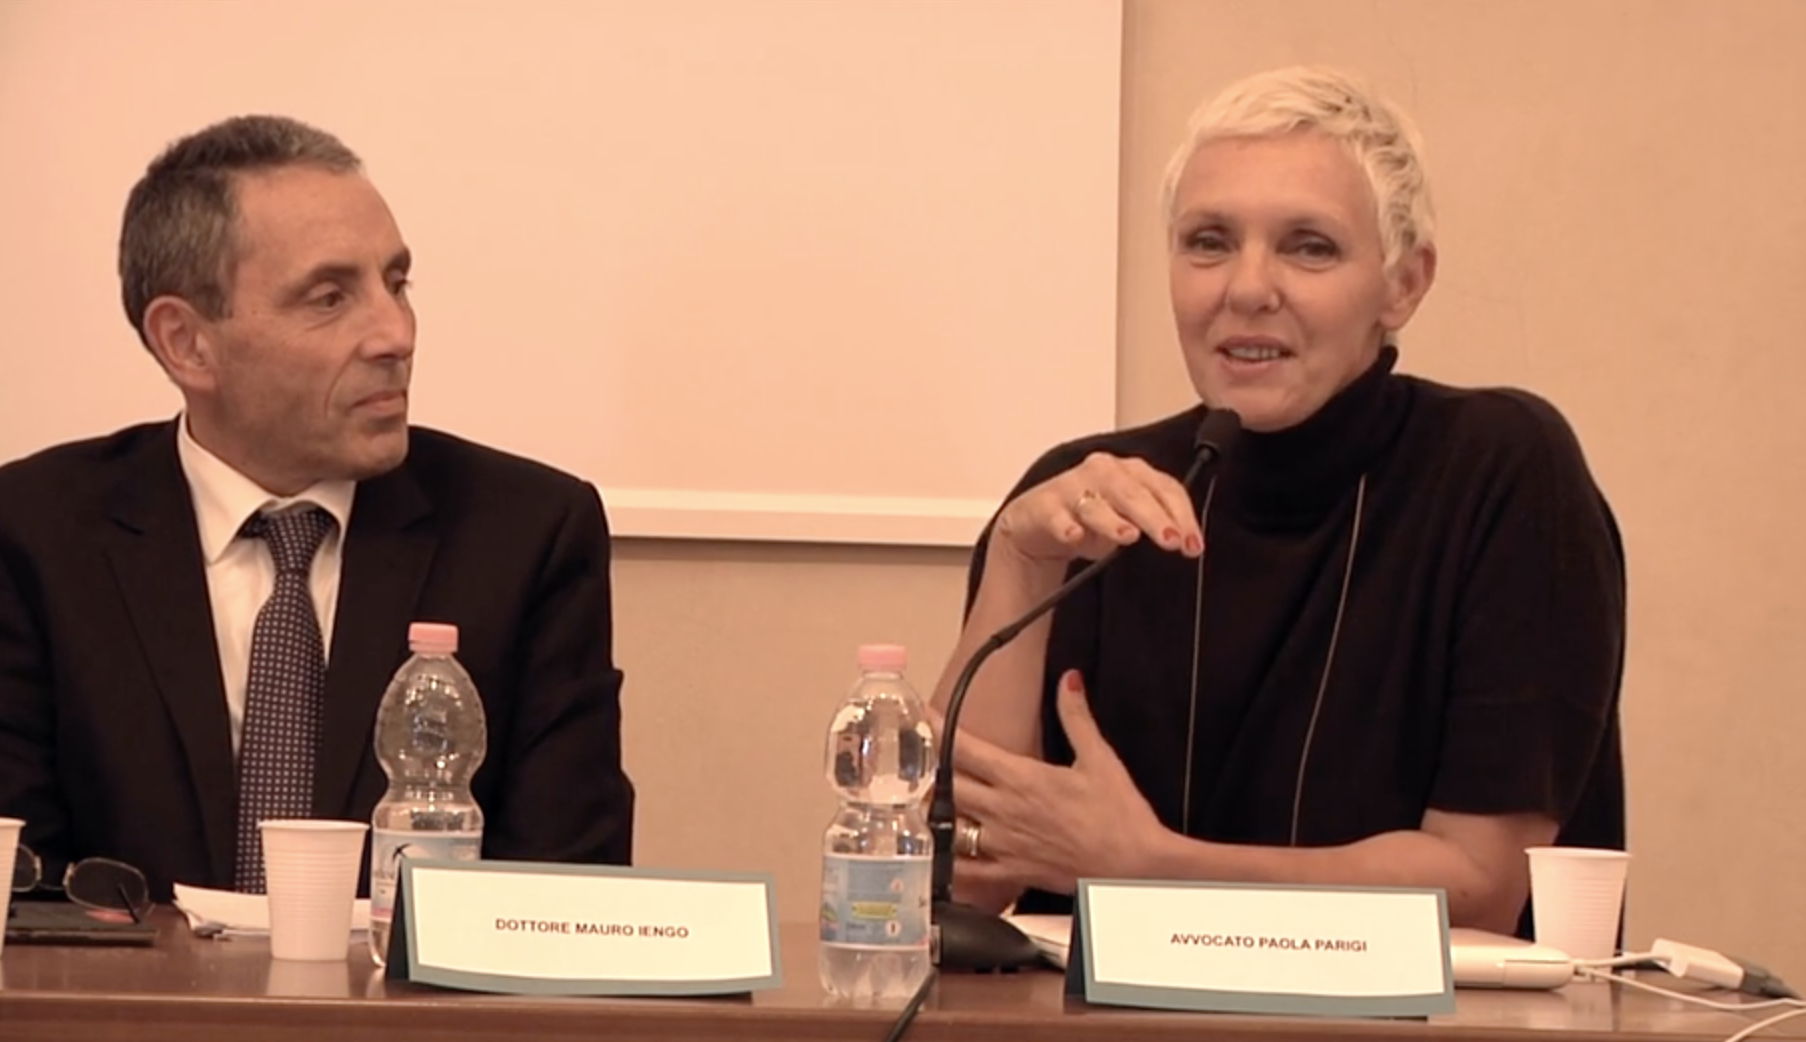 Paola Parigi Intervista Convegno Società ANF Bologna